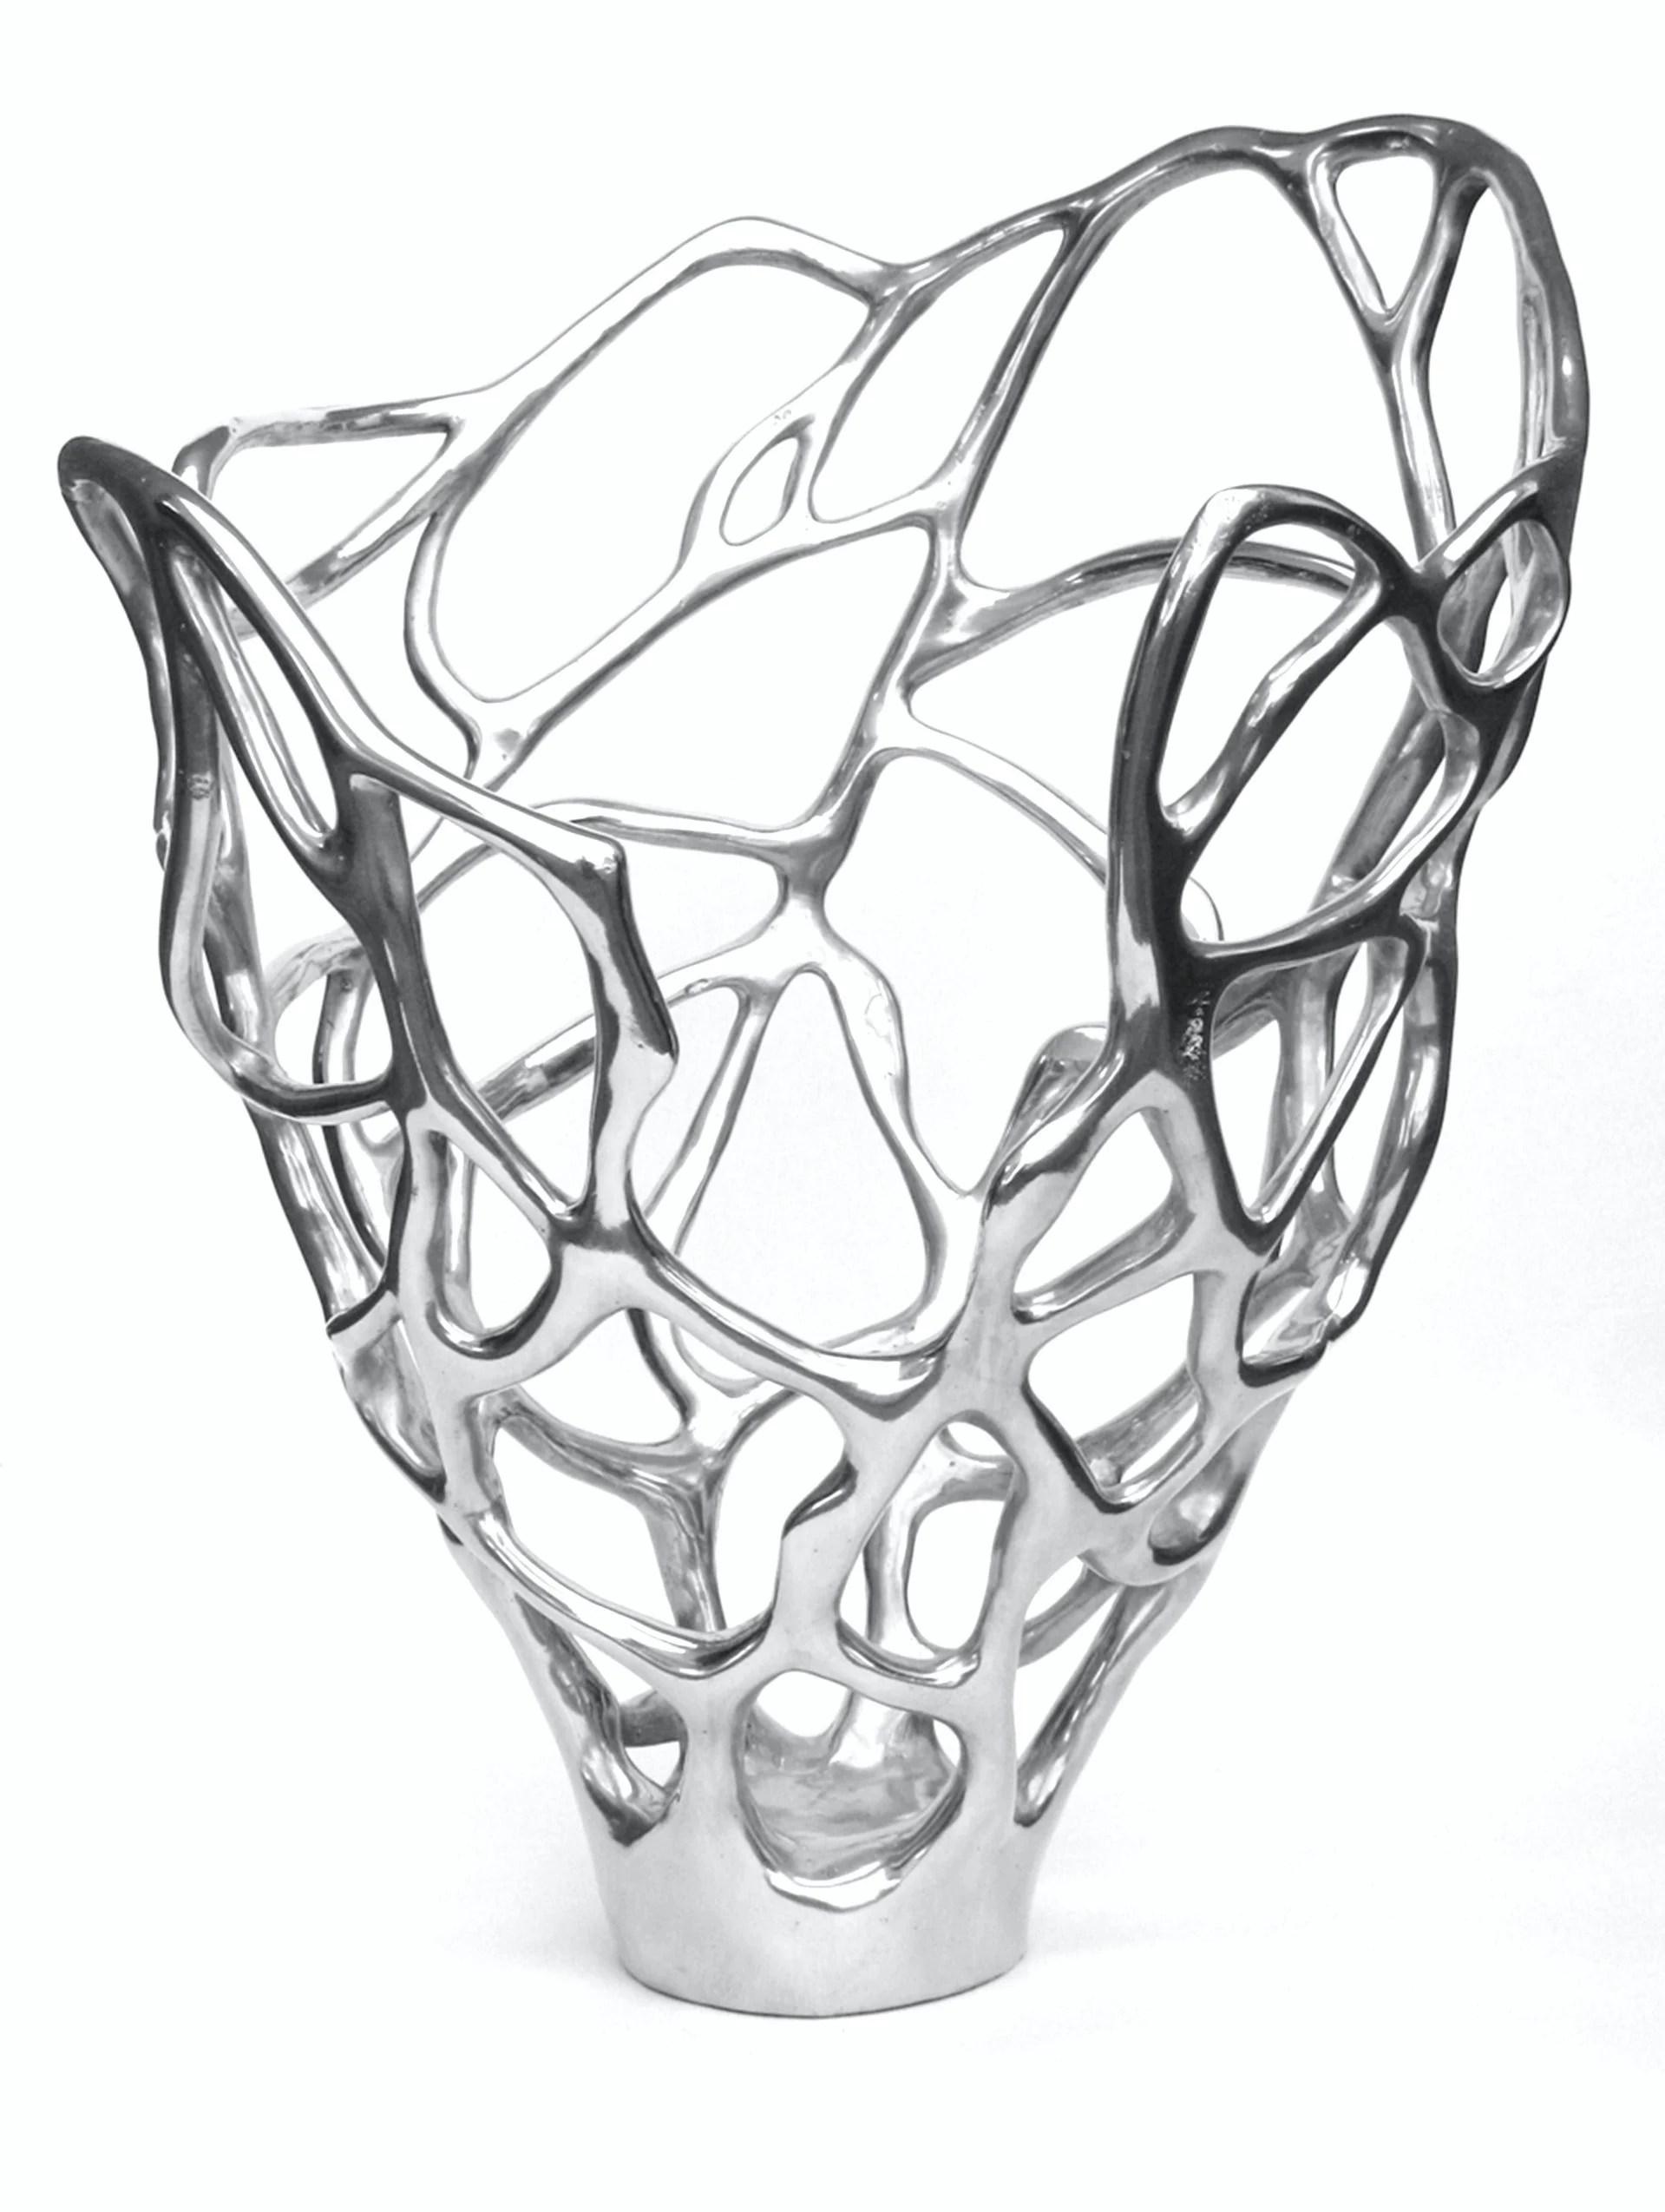 Lifelines Sculptural Art Amp Design